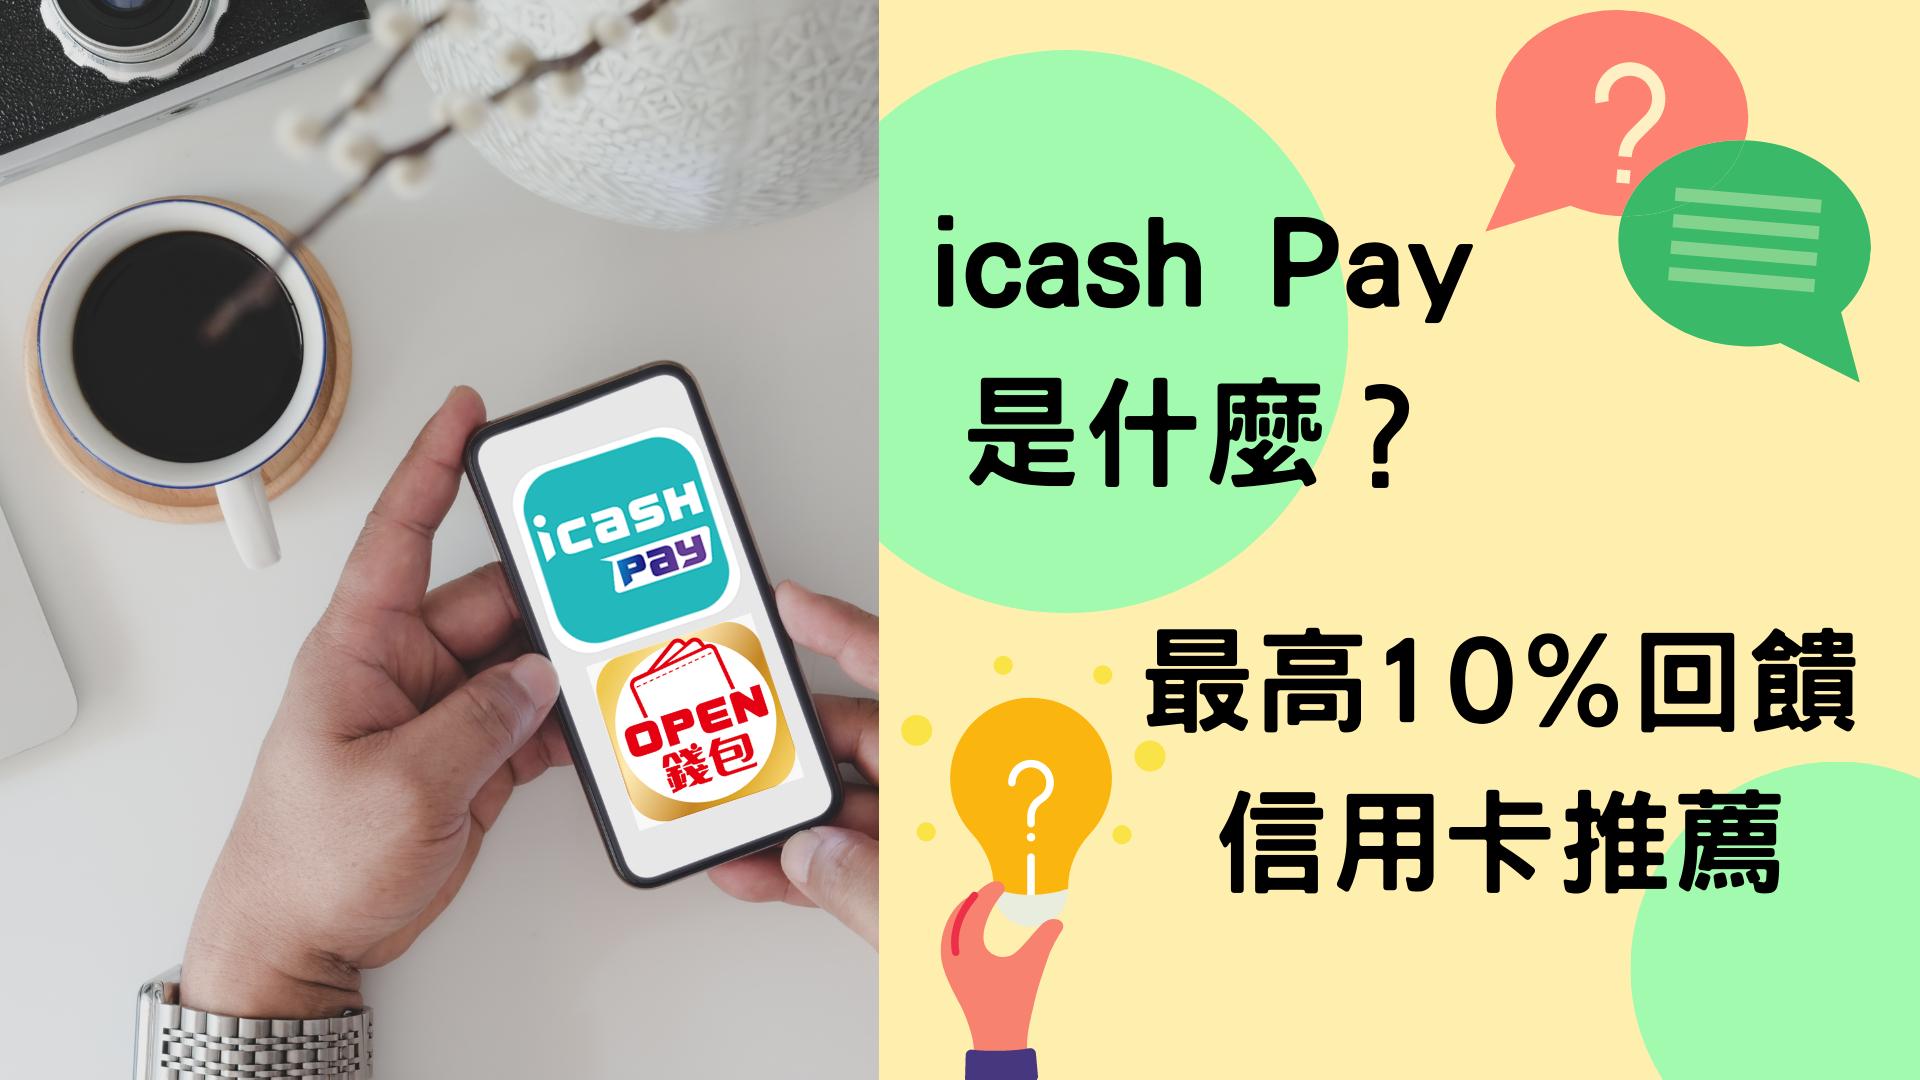 icash Pay是什麼?跟open錢包有什麼差別?最高10%回饋信用卡推薦